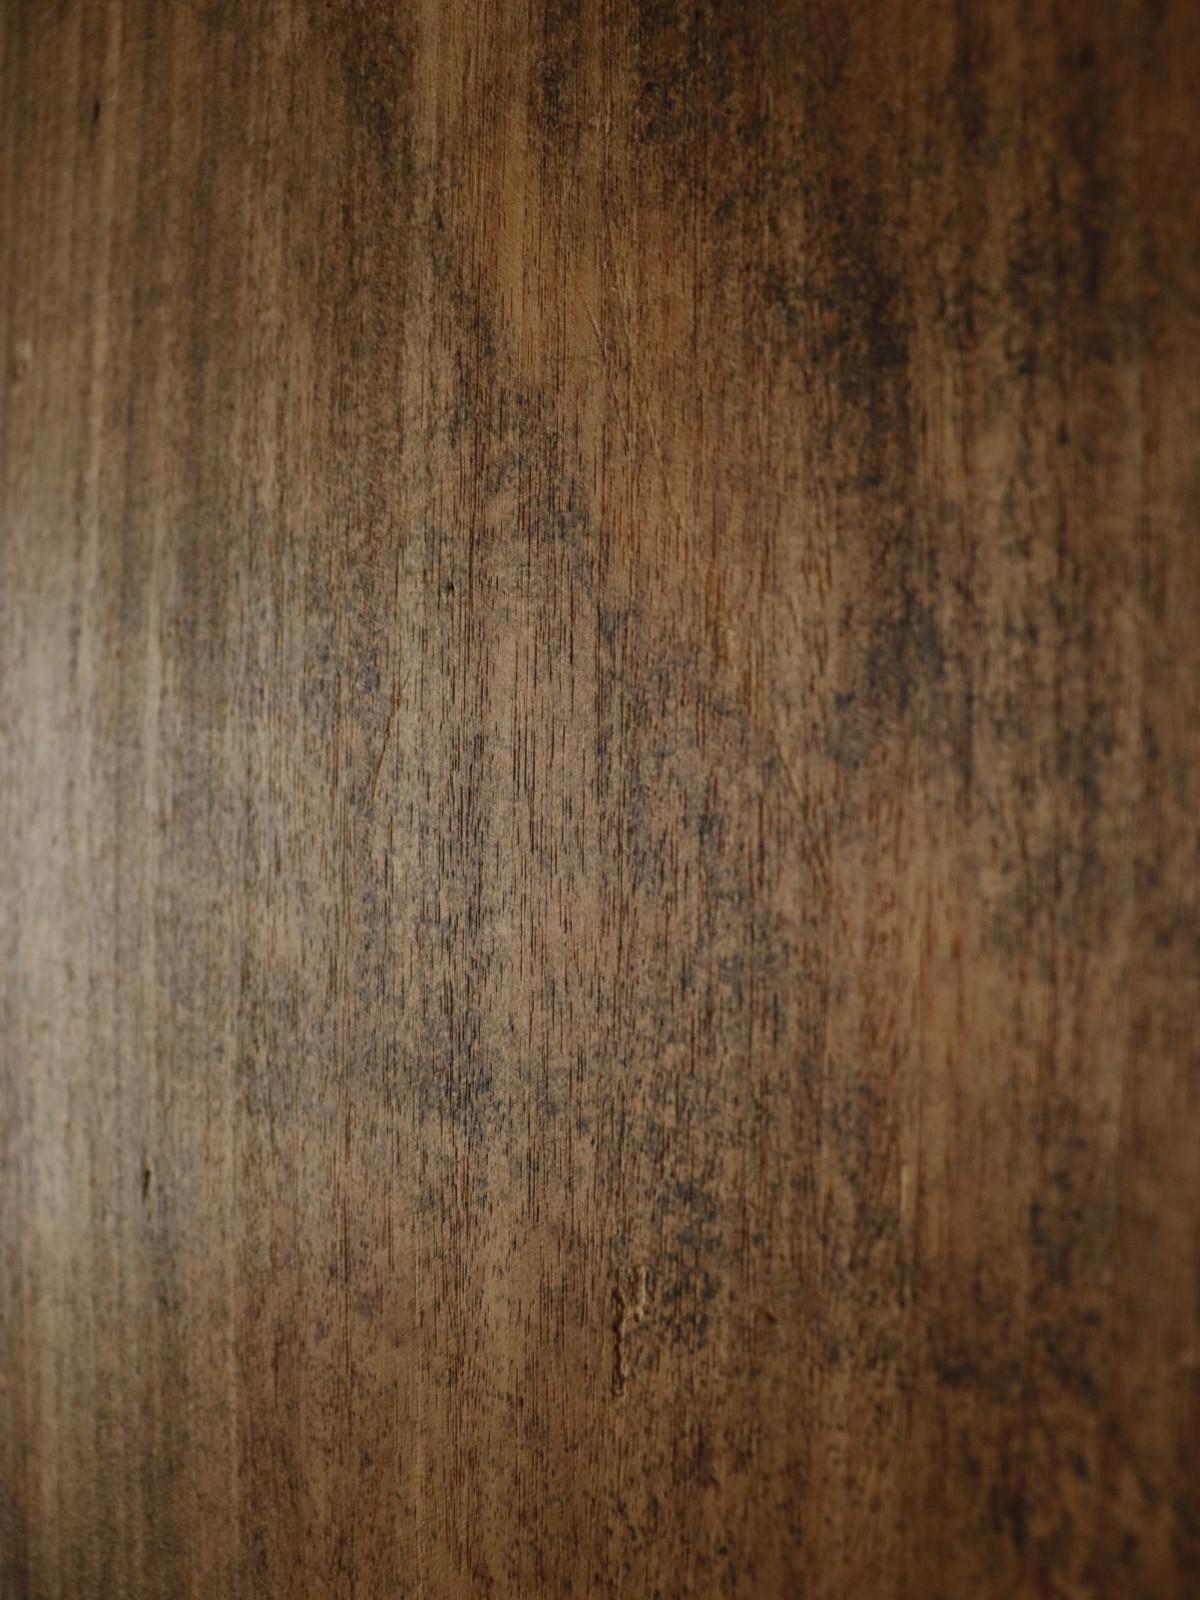 french wood,plank,bread board